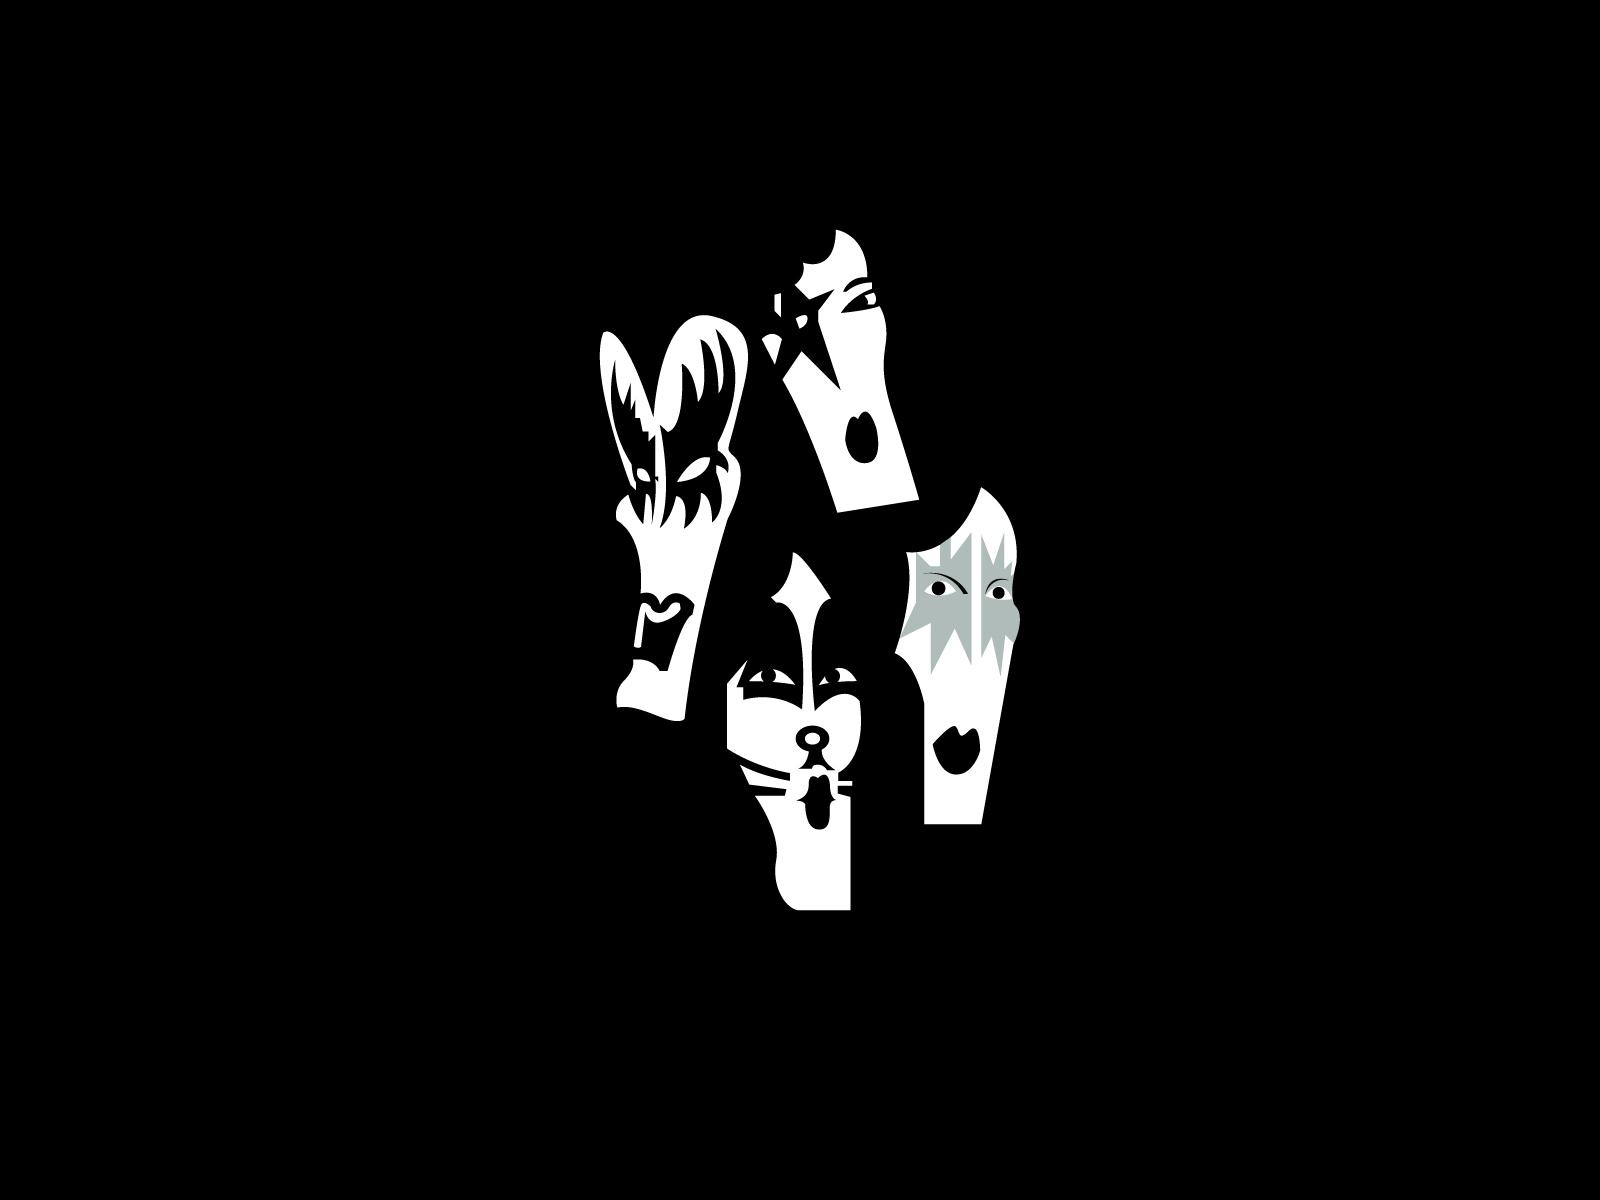 The animals band logo scorpions band logo - Band Logo And Wallpaper Band Logos Rock Band Logos Metal Bands